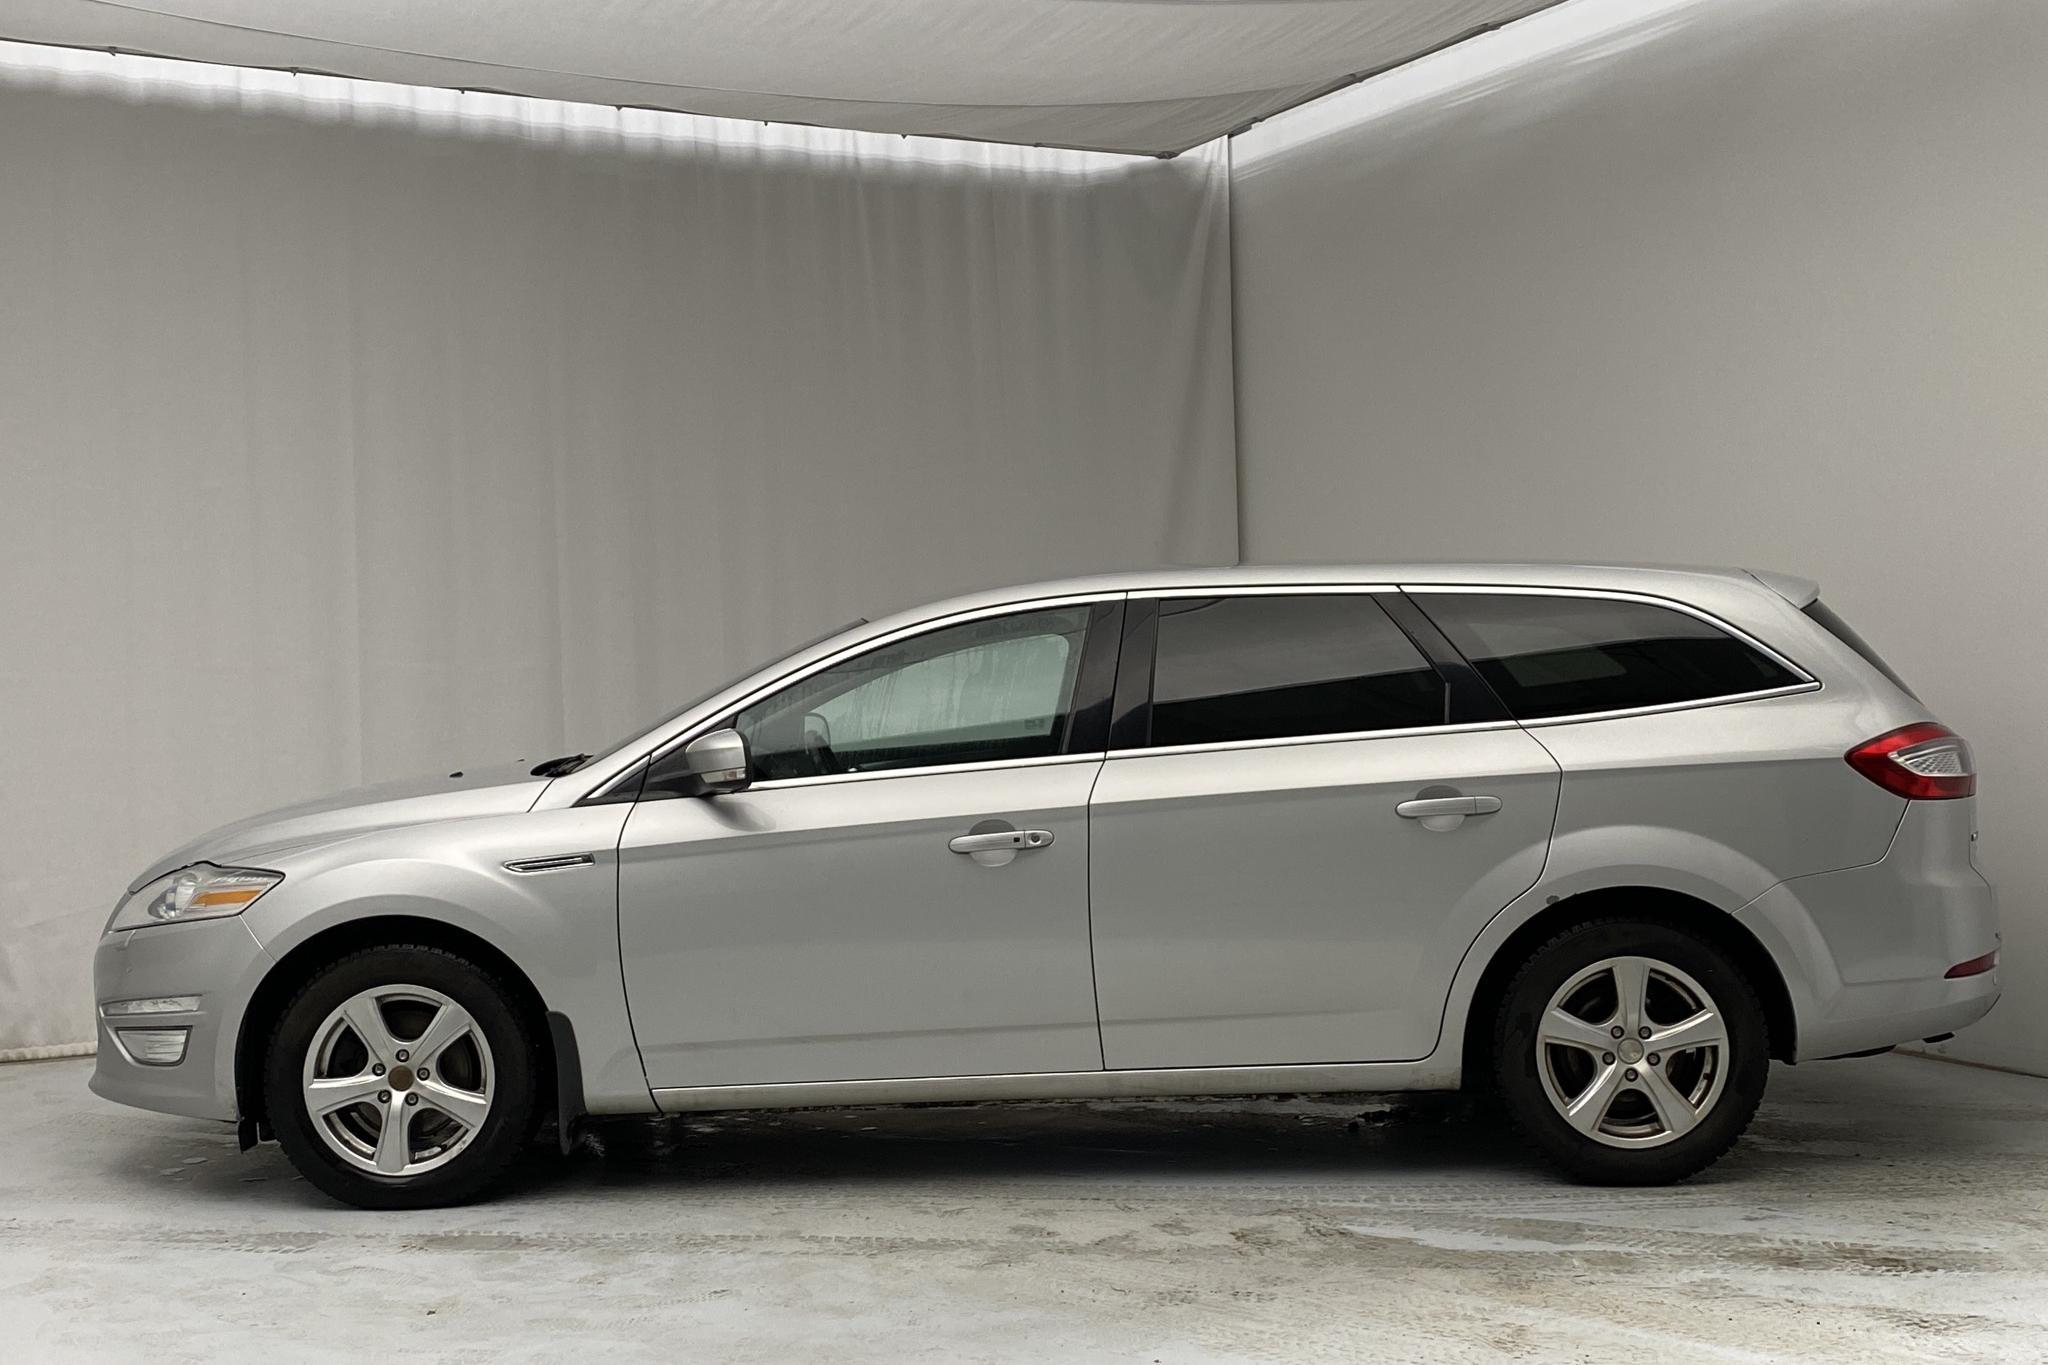 Ford Mondeo 2.0 Duratorq TDCi Kombi (163hk) - 20 234 mil - Automat - grå - 2011